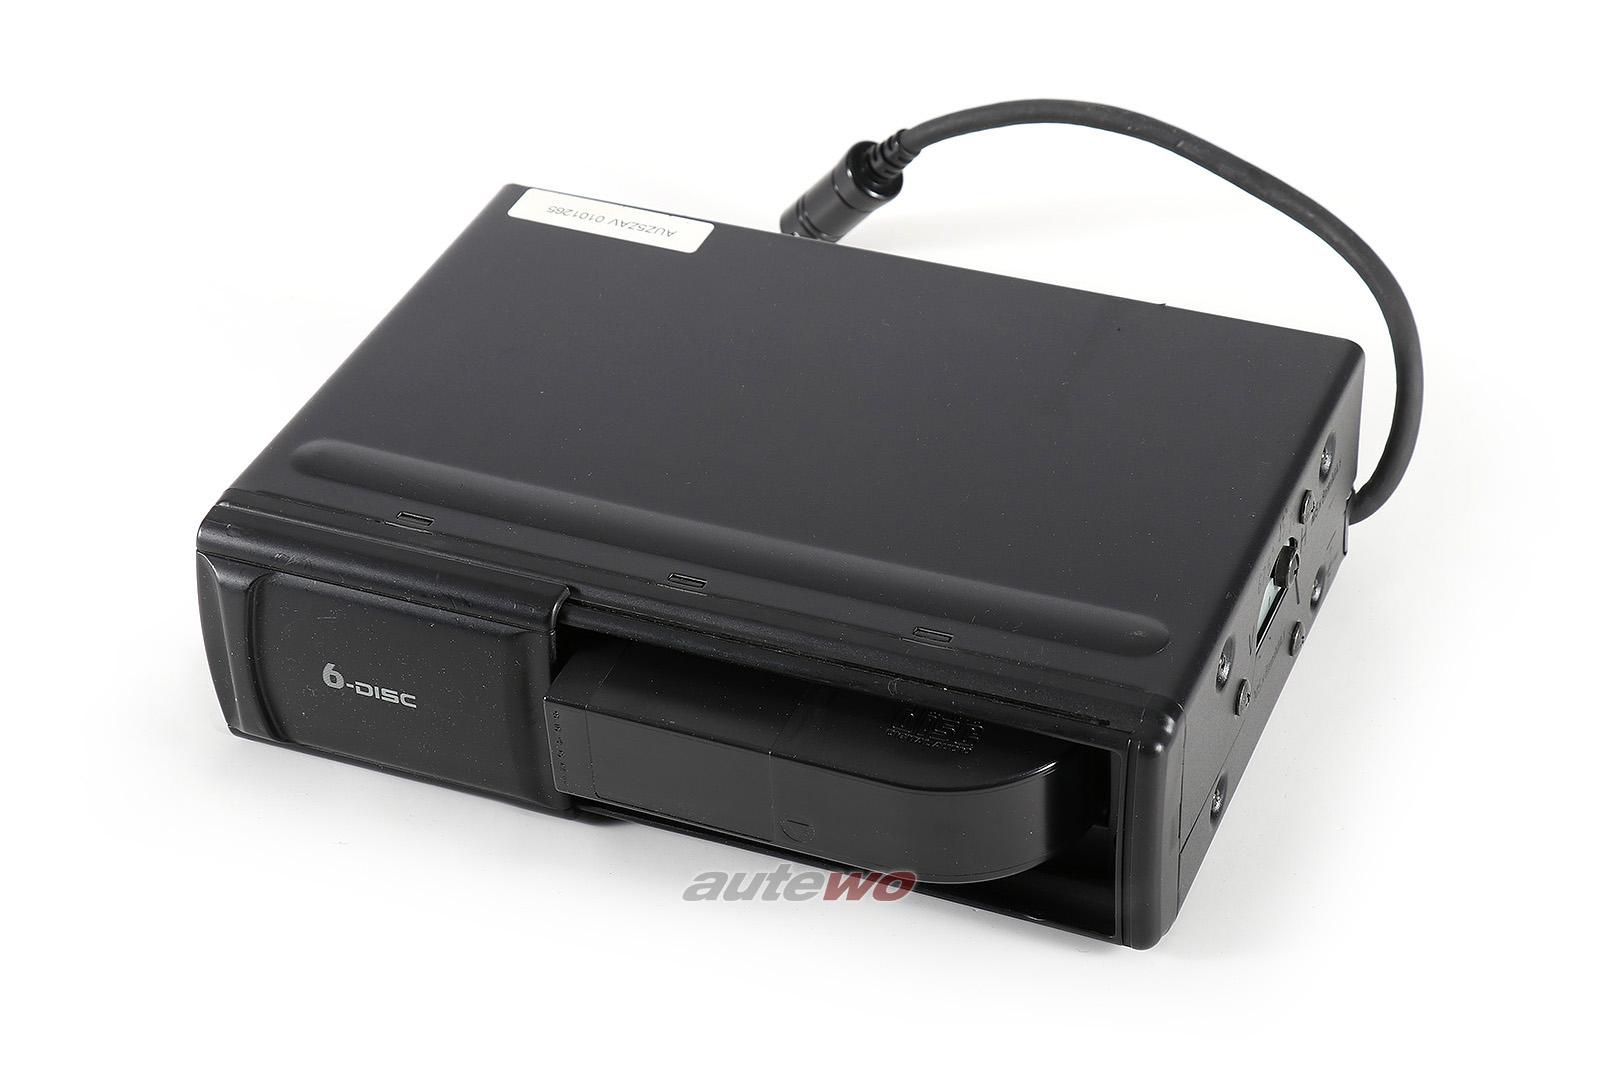 4B0035111 4B0035111A Audi A3 8L/A4 B5/A6 4B/A8 D2 6-fach CD-Wechsler